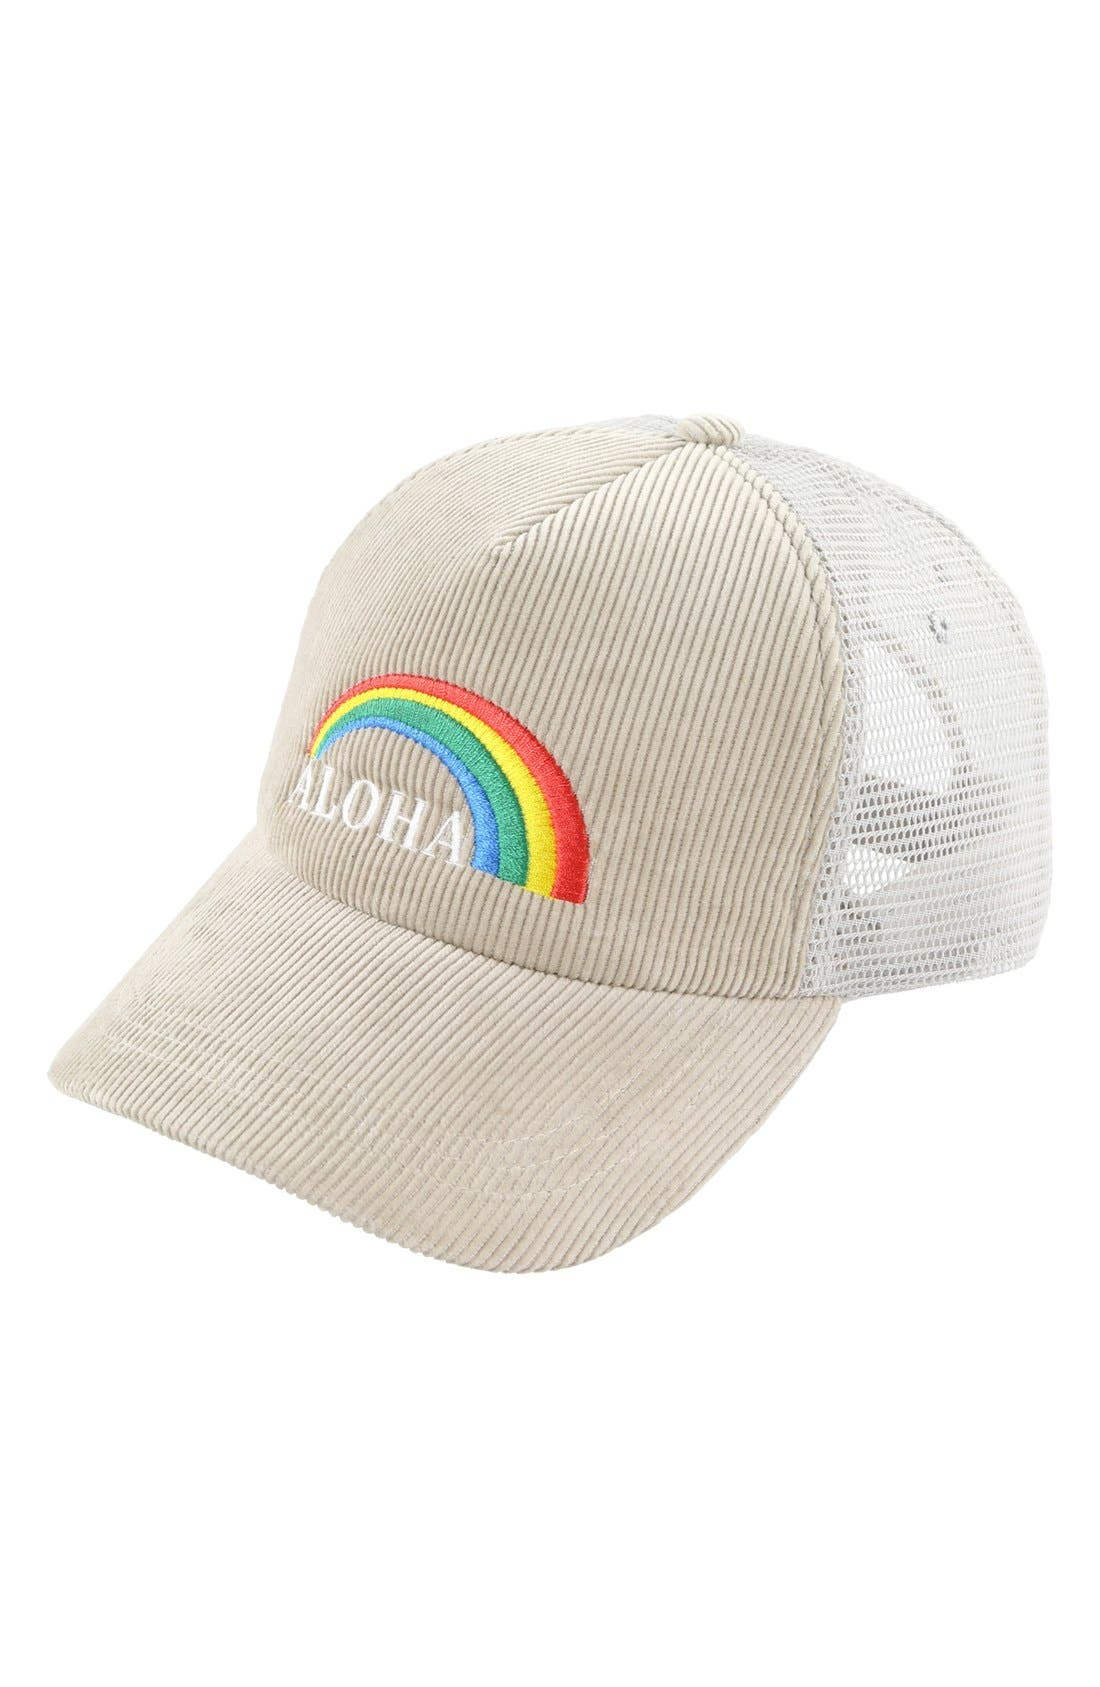 Main Image - O'Neill 'Aloha' Corduroy Trucker Hat